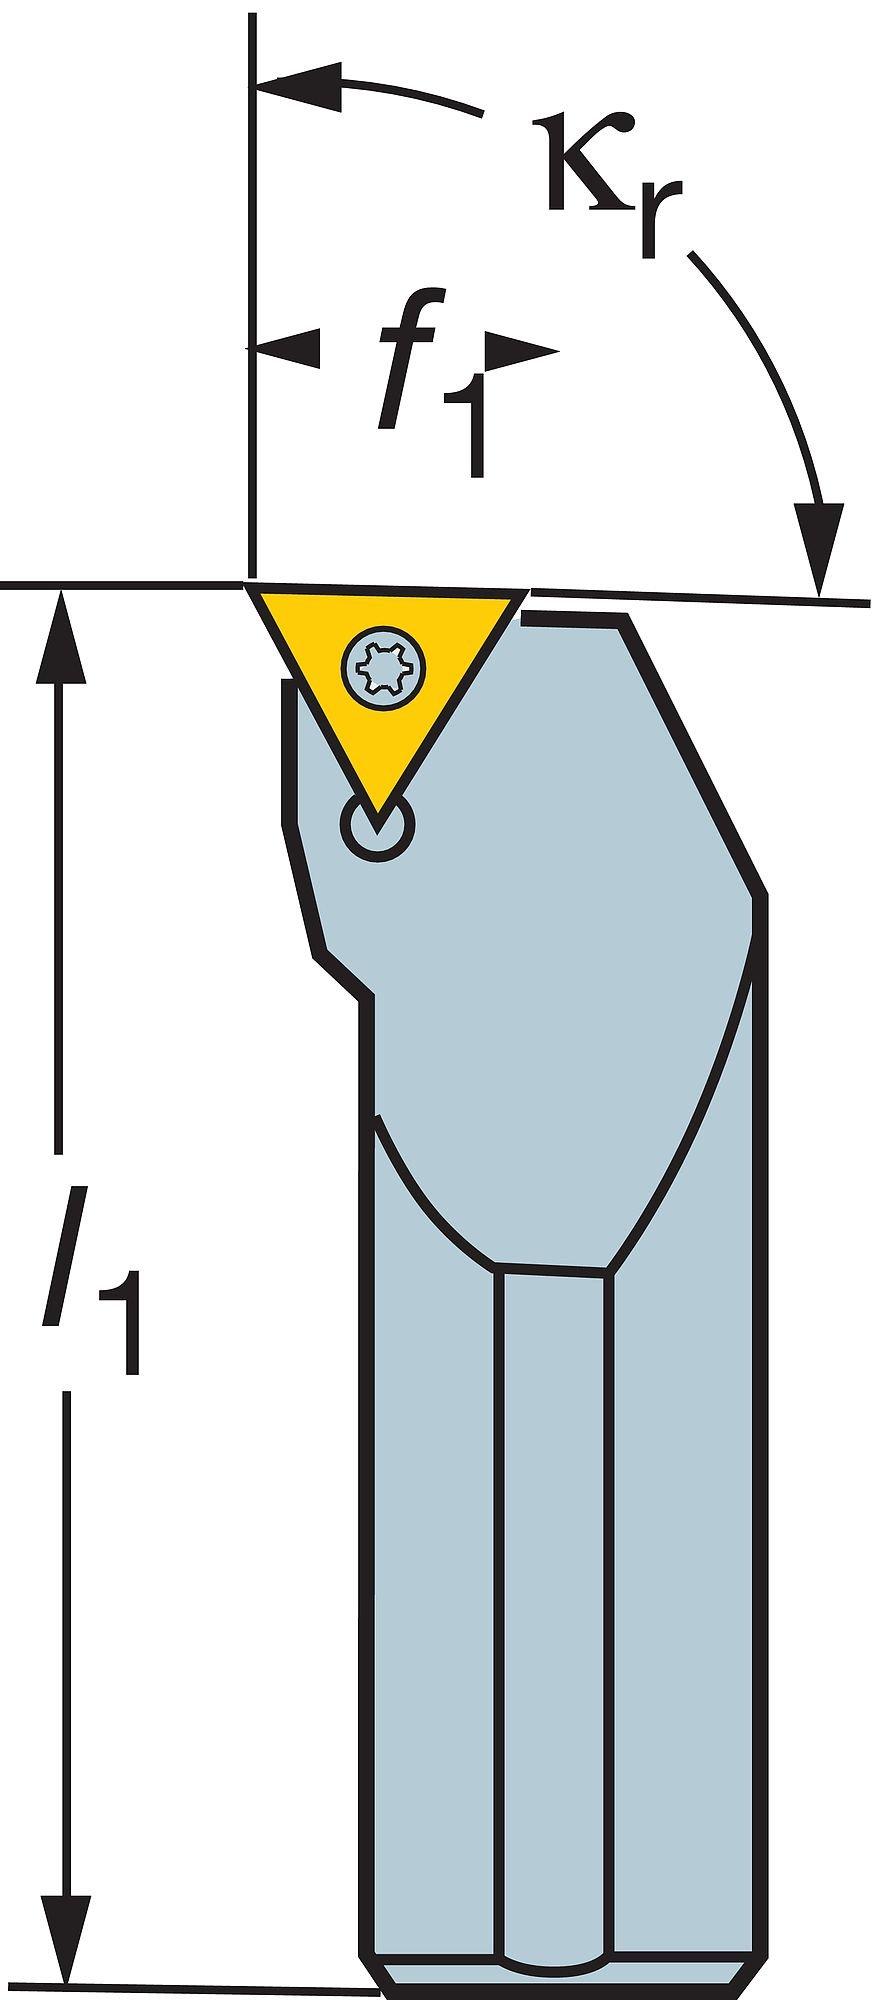 1.2 8mm Shank Diameter Steel TCMT 1.2 100mm Length x 5.9mm Width Internal Screw Clamp 0 Insert Size Right Hand Sandvik Coromant A08H-STFCR 06 Turning Insert Holder Round Shank